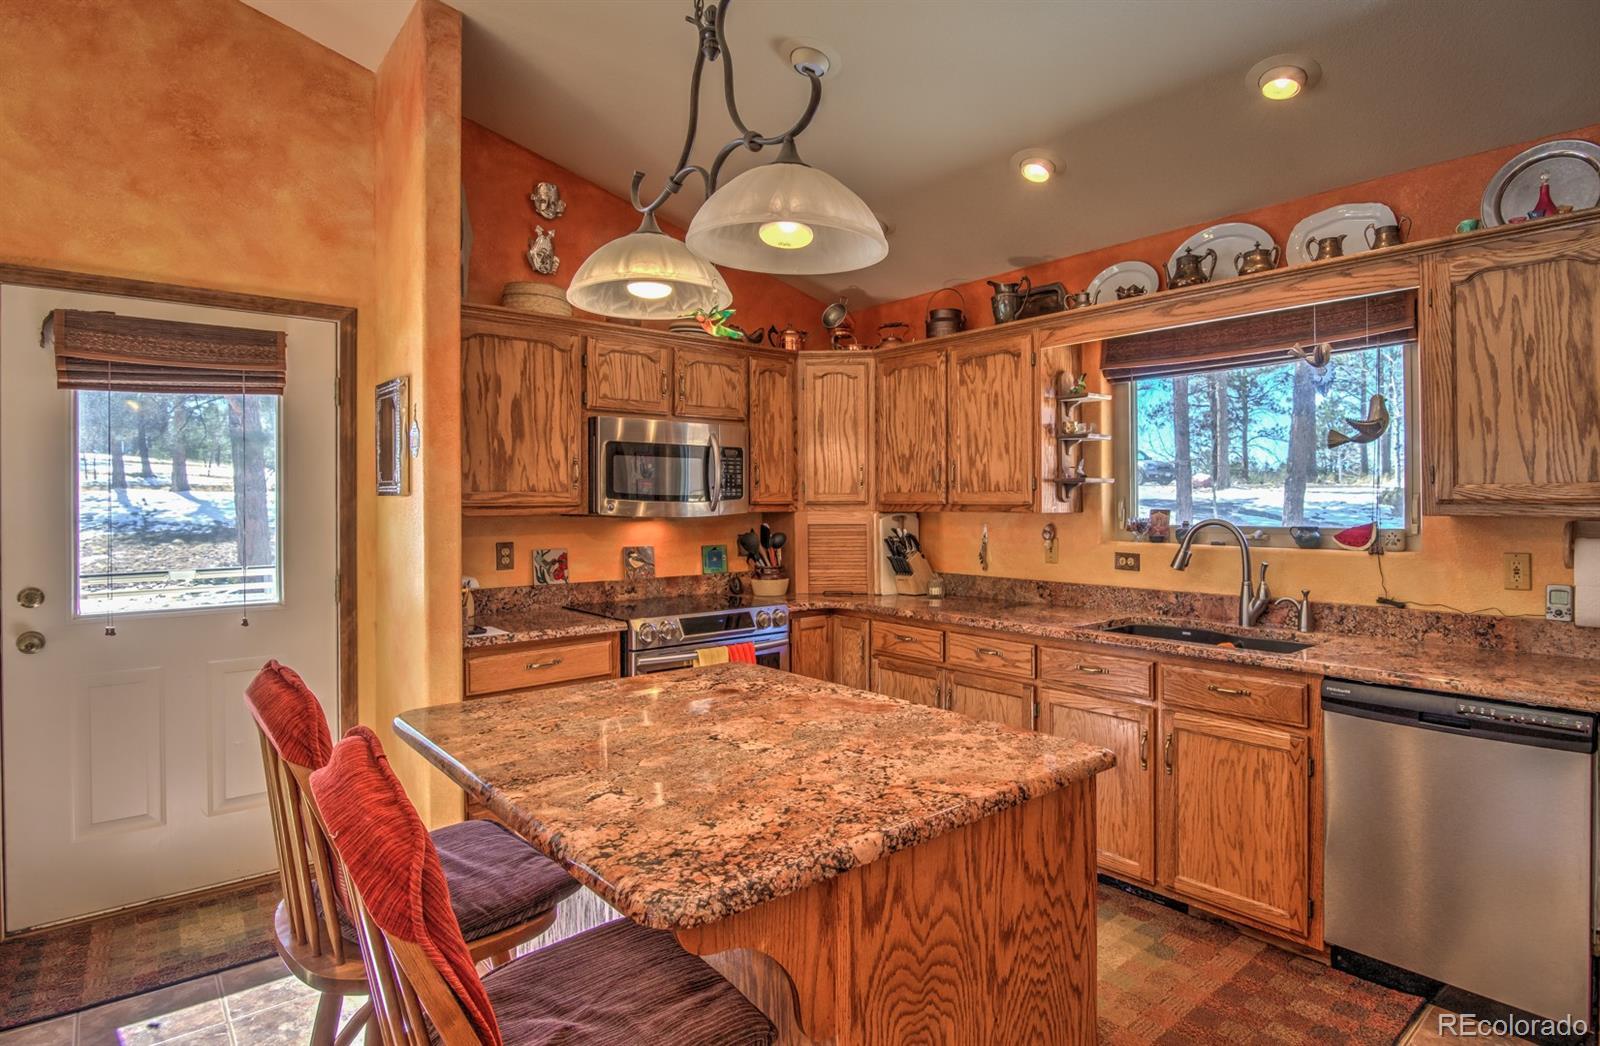 MLS# 6725557 - 7 - 126 Druid Trail, Florissant, CO 80816